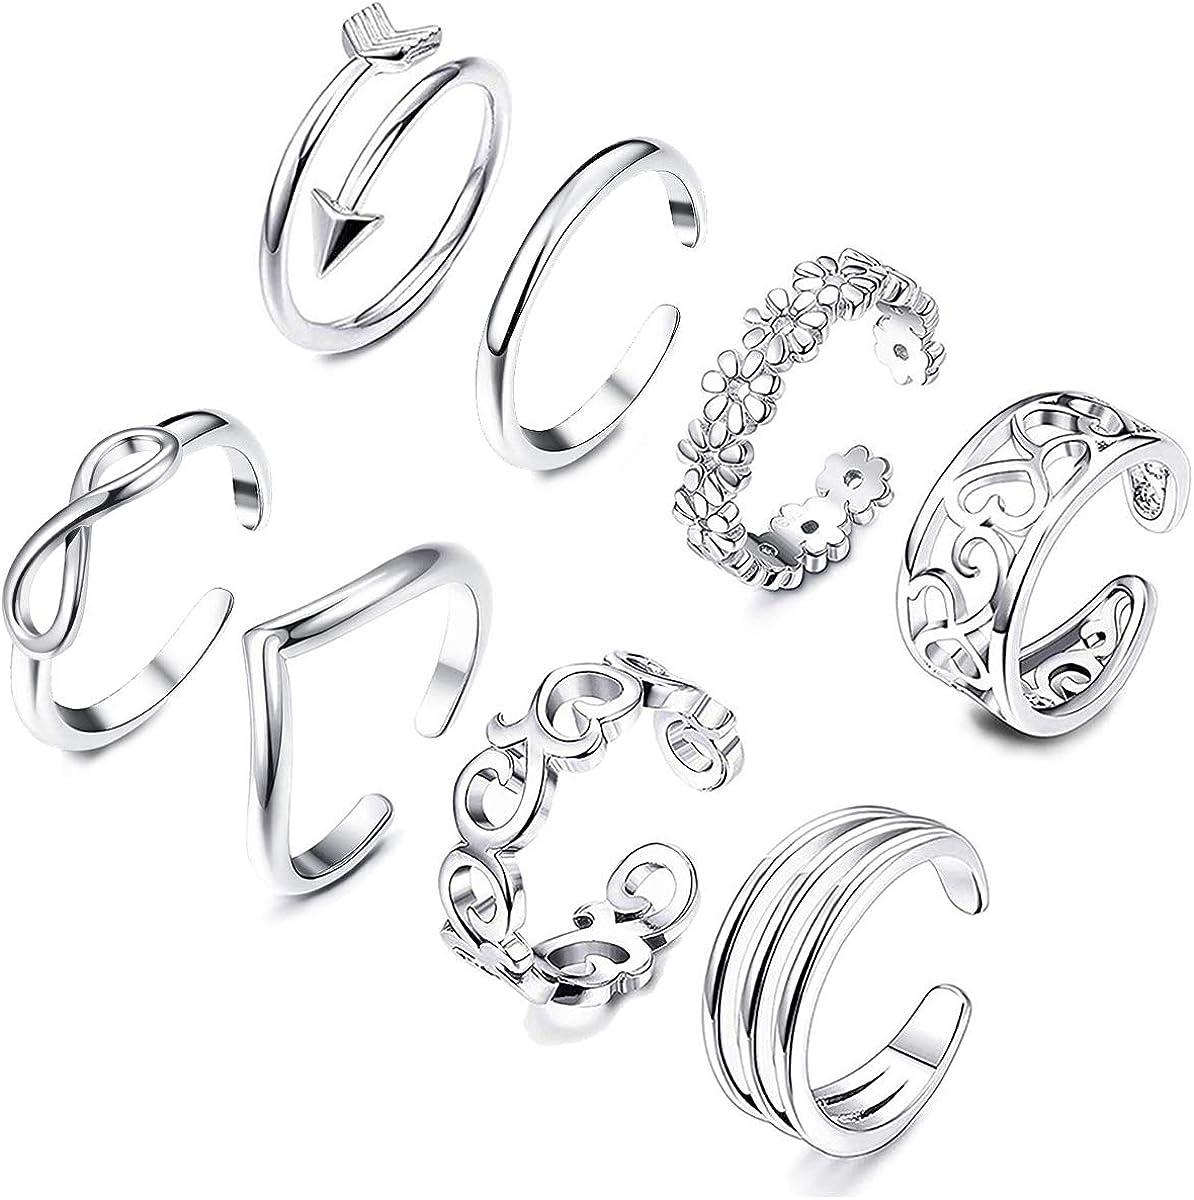 Latest item KOHOTA 8PCS Open Toe Rings Very popular! Women Set Adjustab Hypoallergenic for